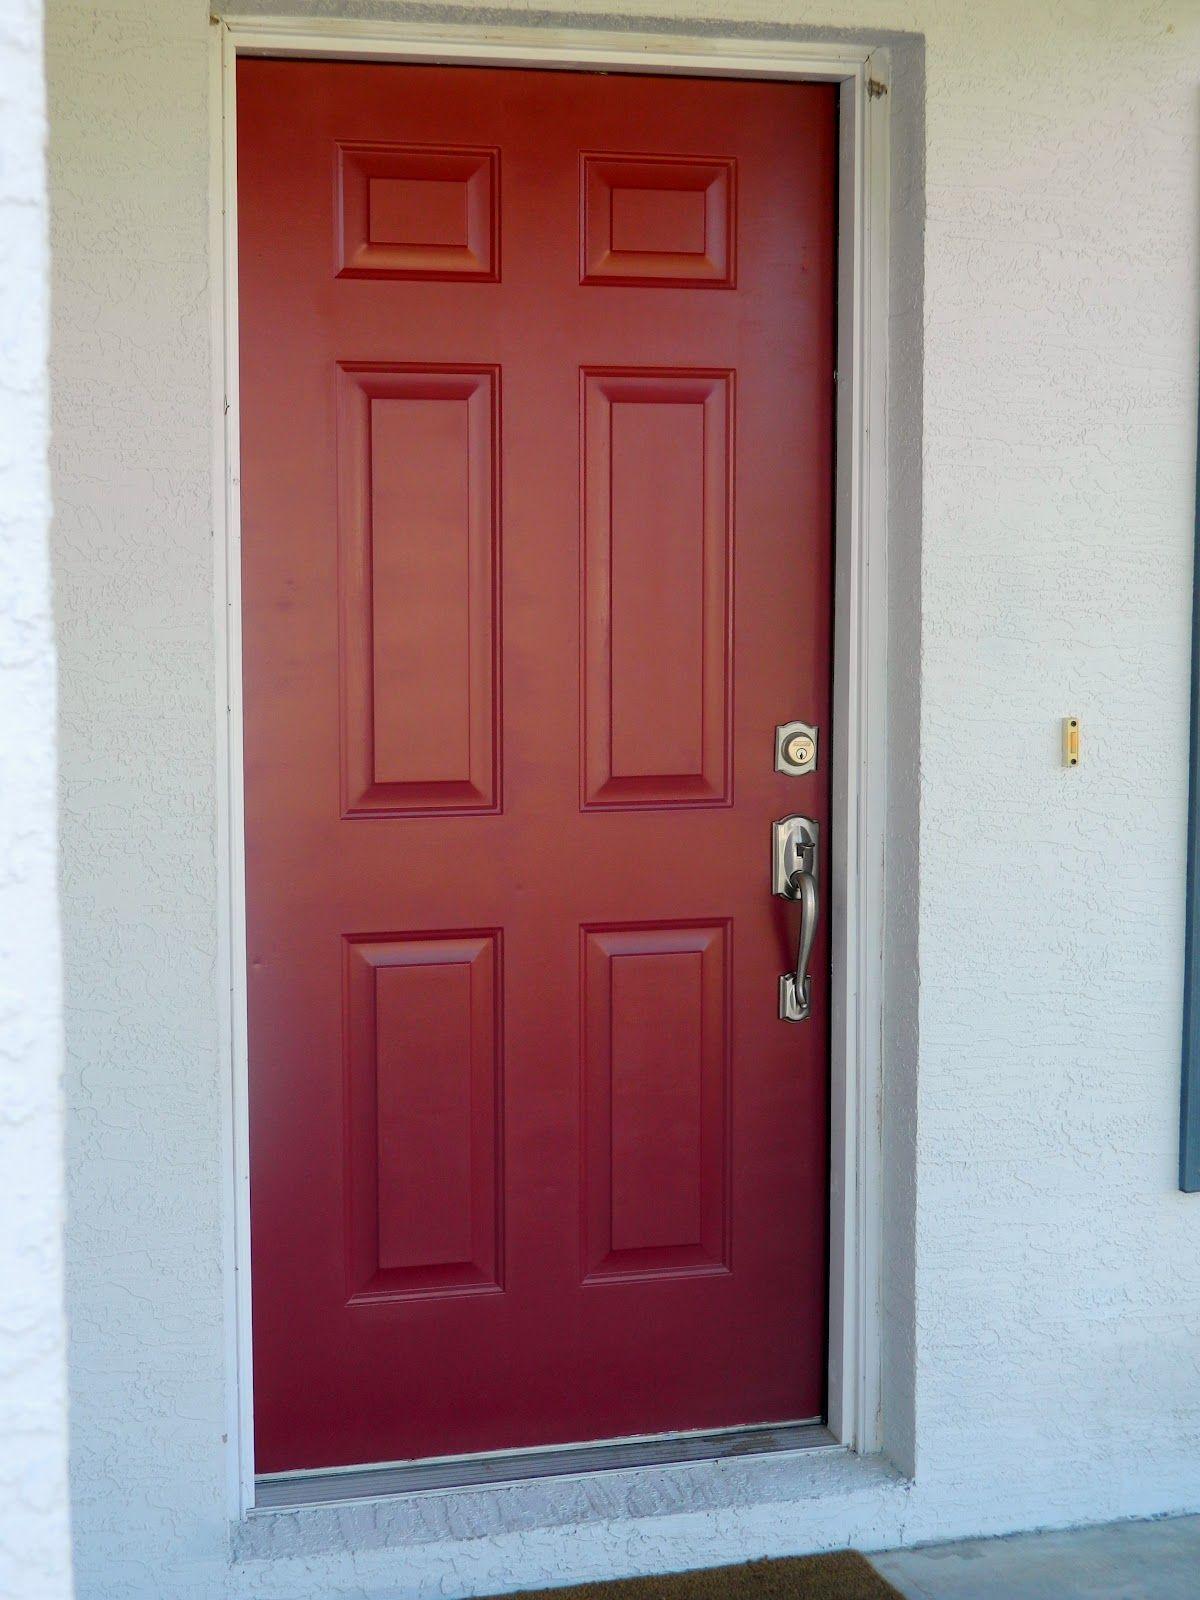 Home Depot Oak Ridge Exterior Doors